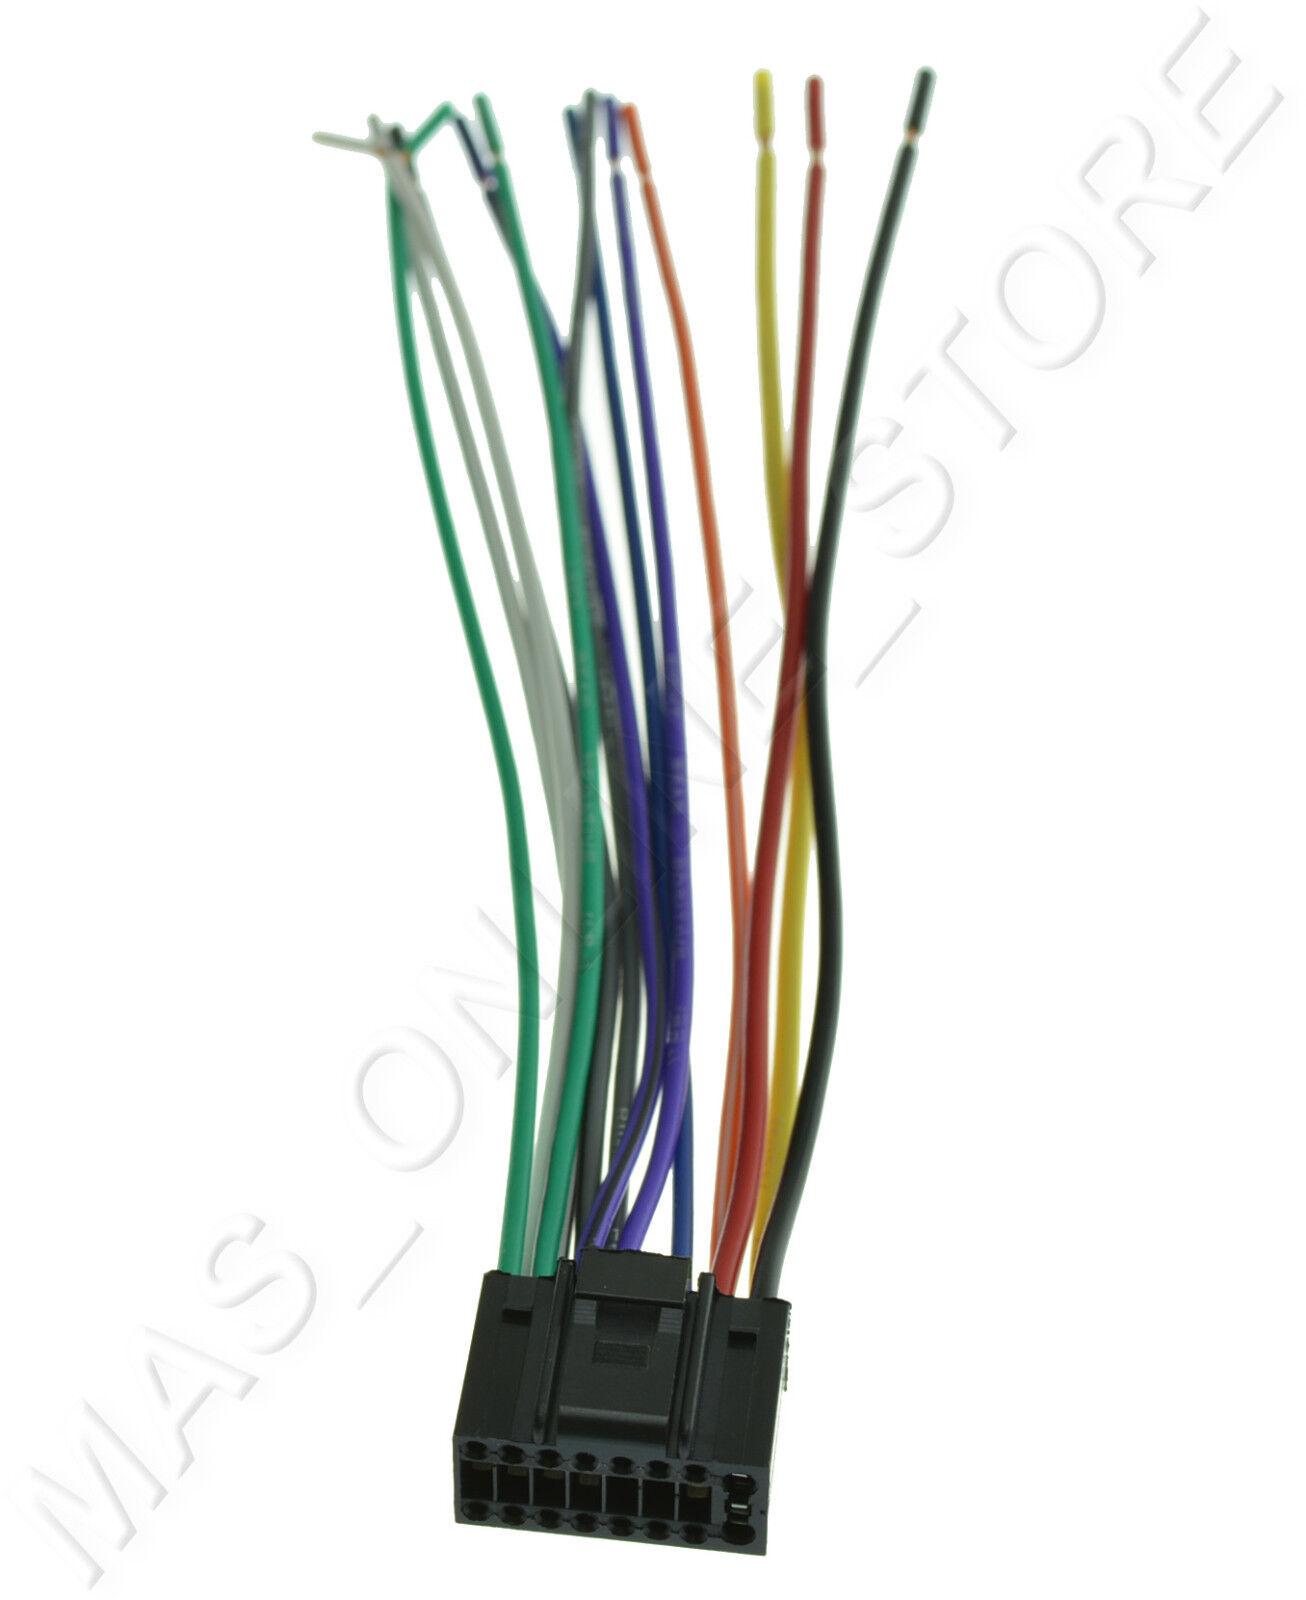 Jvc Kd R300 Wiring Harness - Wiring Diagram K8 Kd S Jvc Wire Harness on